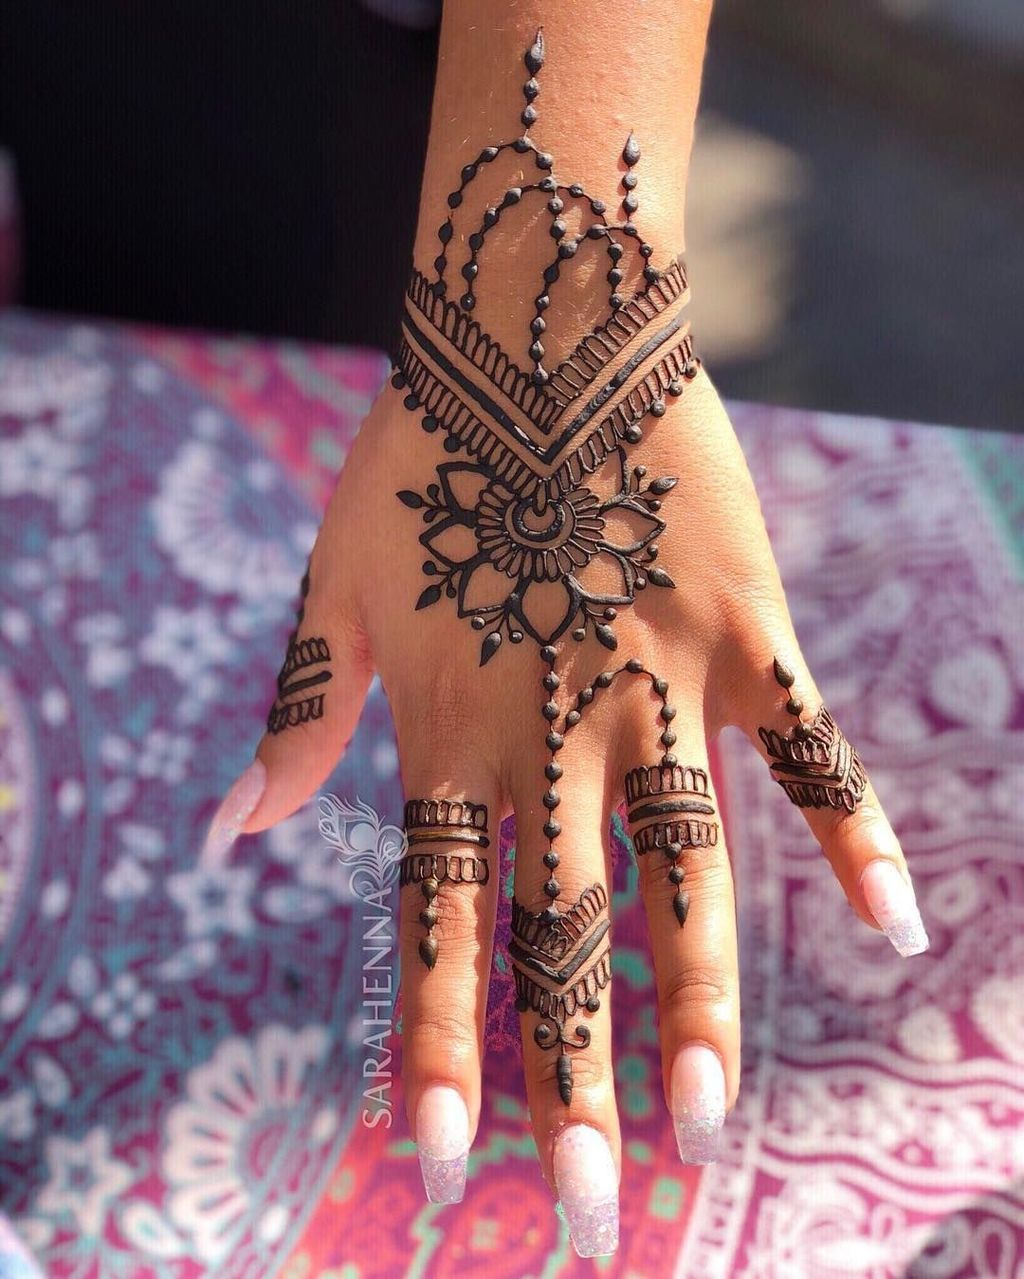 36 Beautiful Henna Tattoo Design Ideas Henna Tattoo Designs Simple Henna Designs Easy Pretty Henna Designs